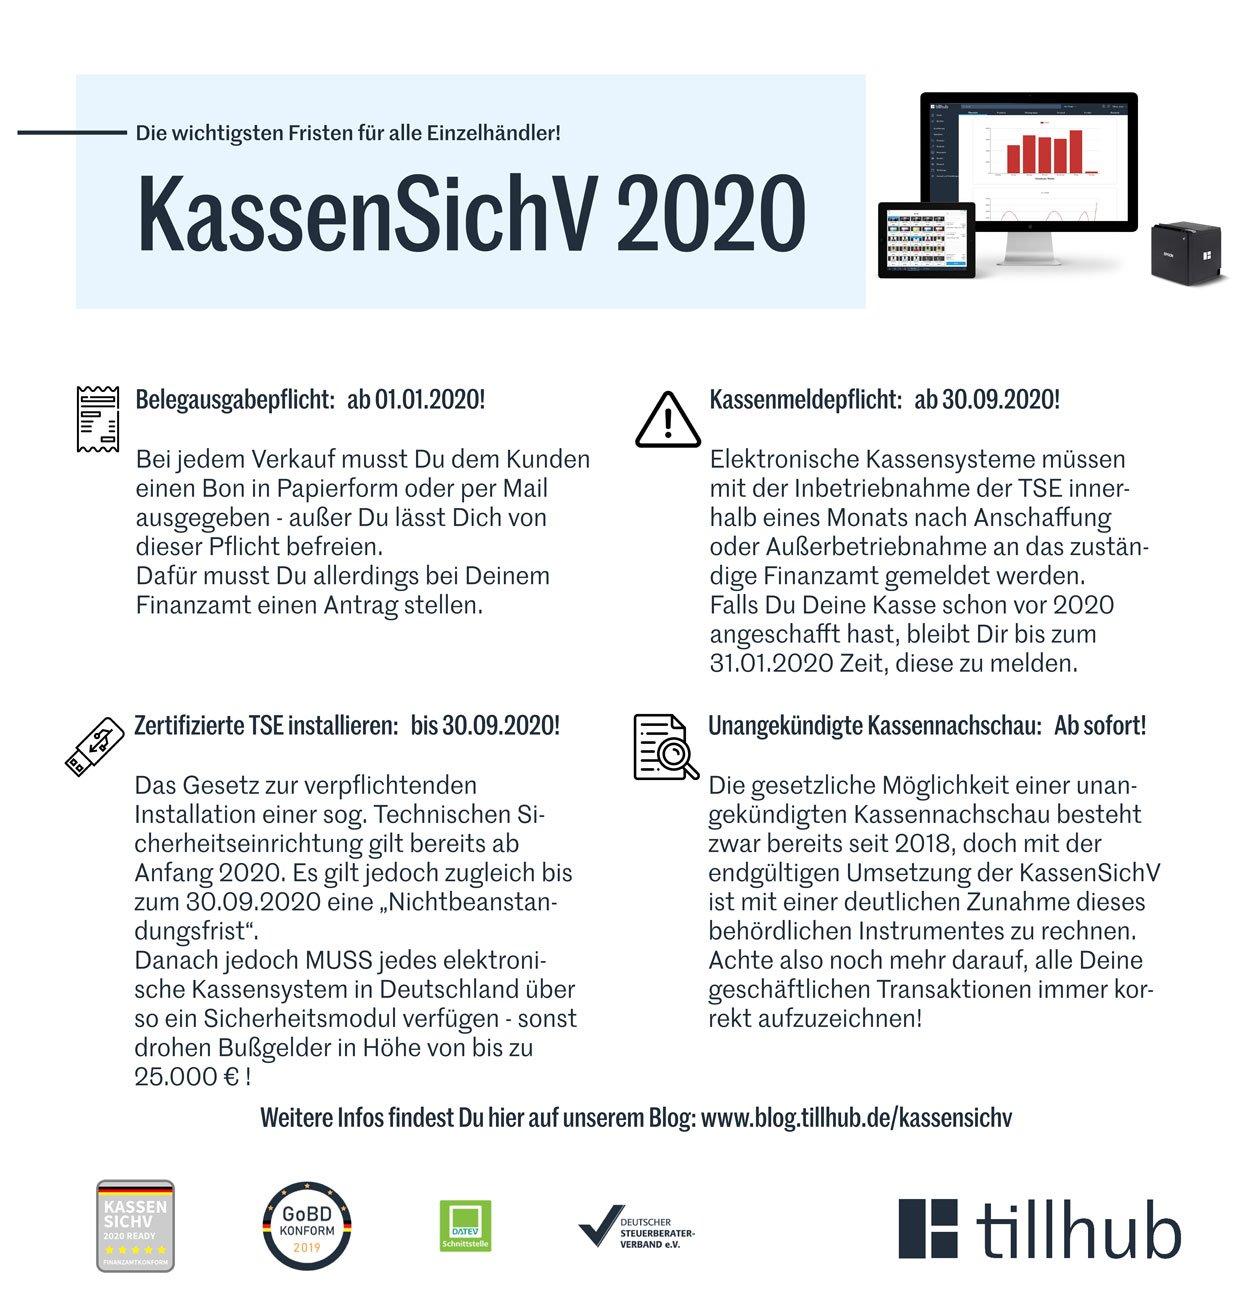 kassensichv-infografik